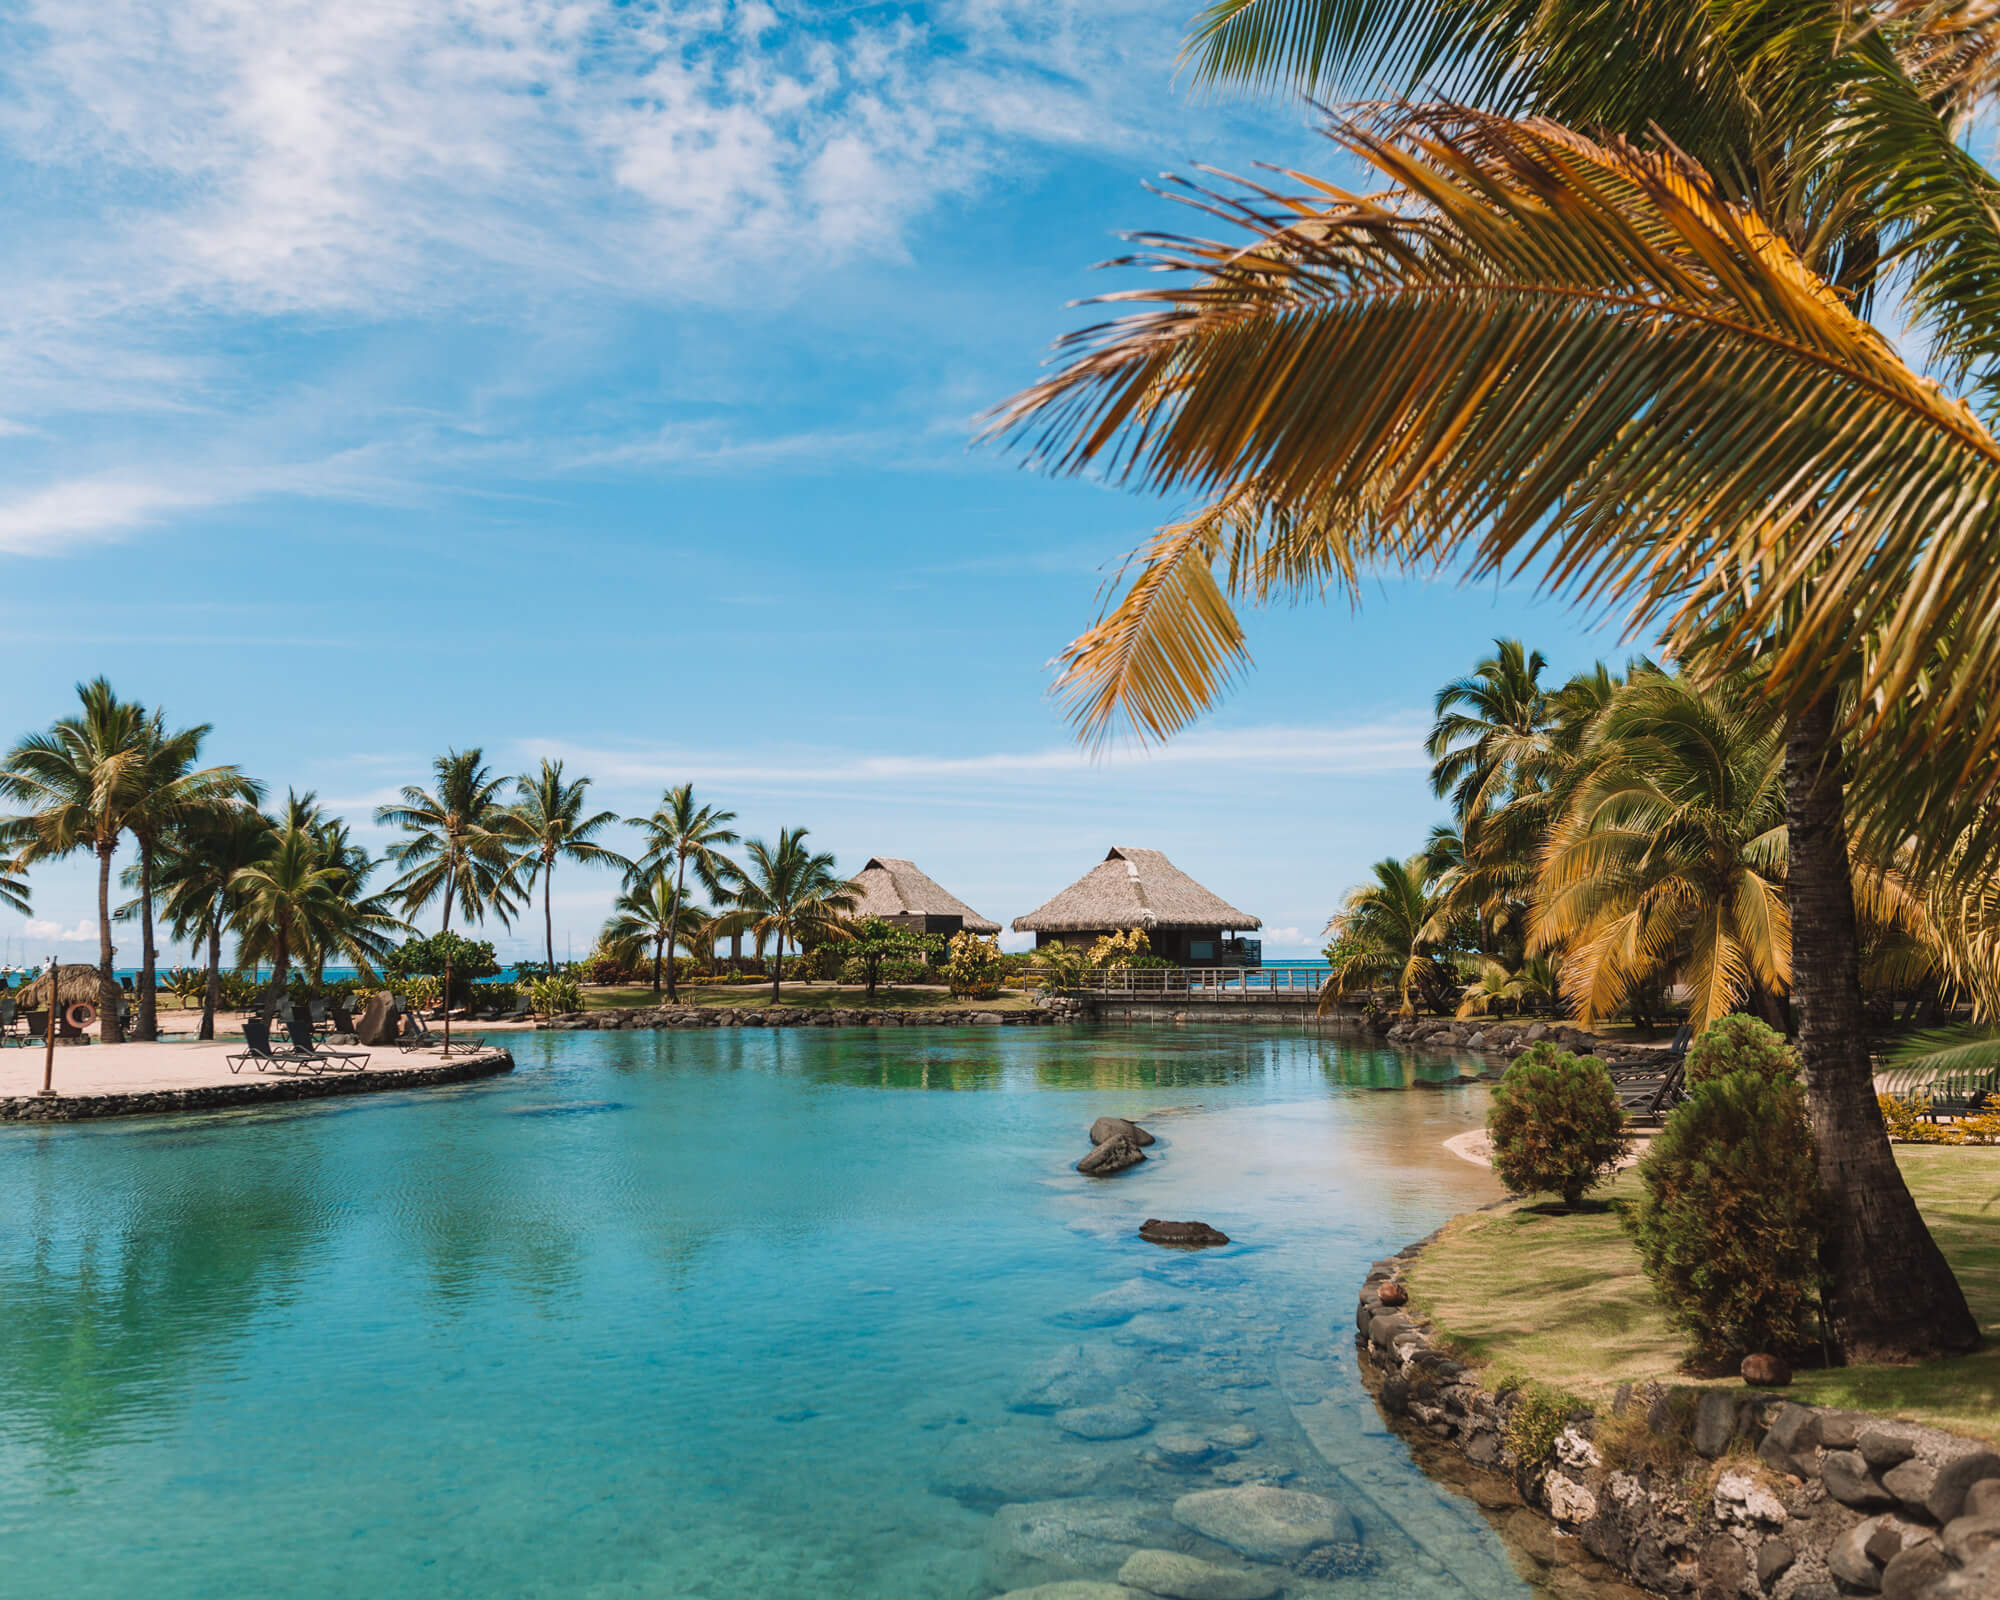 lush and tropical view of the lagoonarium at the intercontinental tahiti